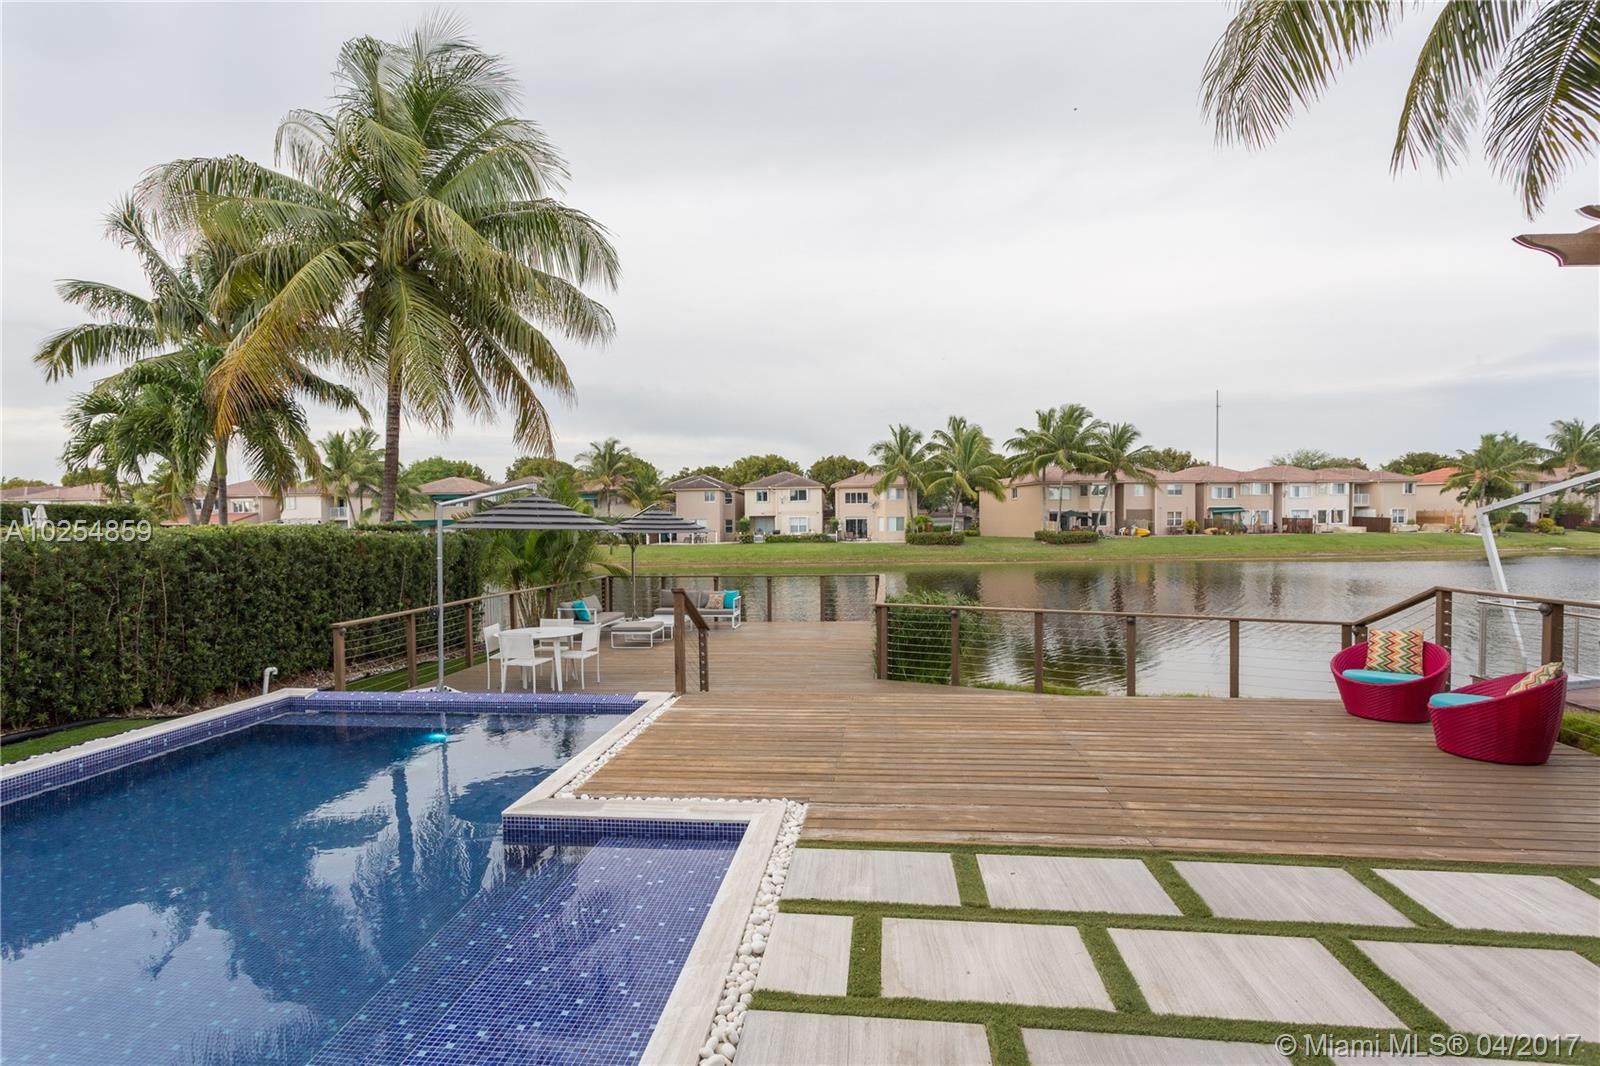 11167 NW 72 Terrace, Doral FL, 33178